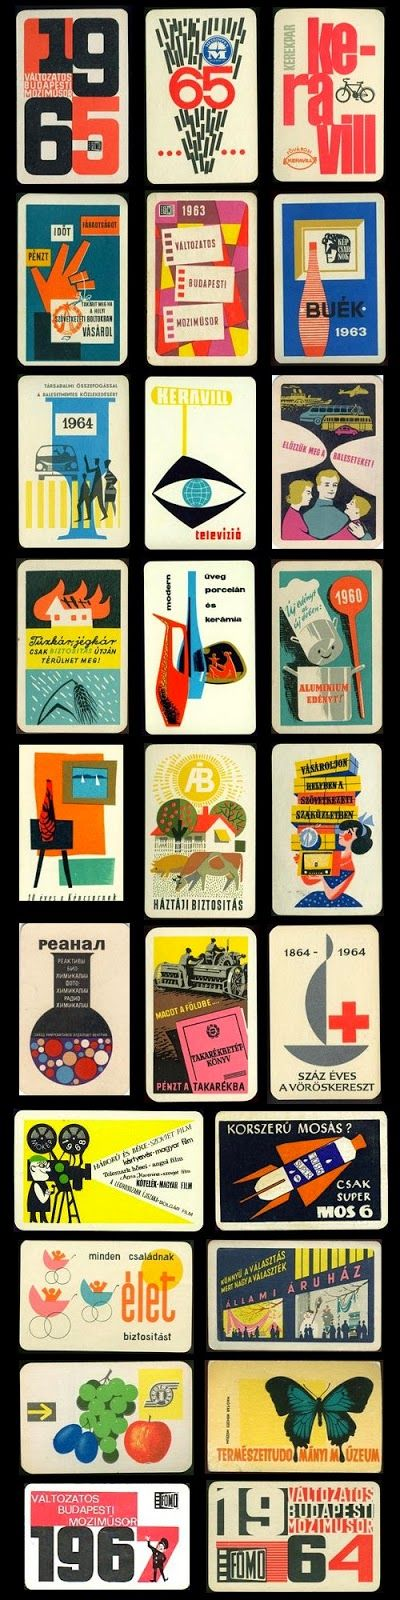 Ame Design - amenidades do Design . blog